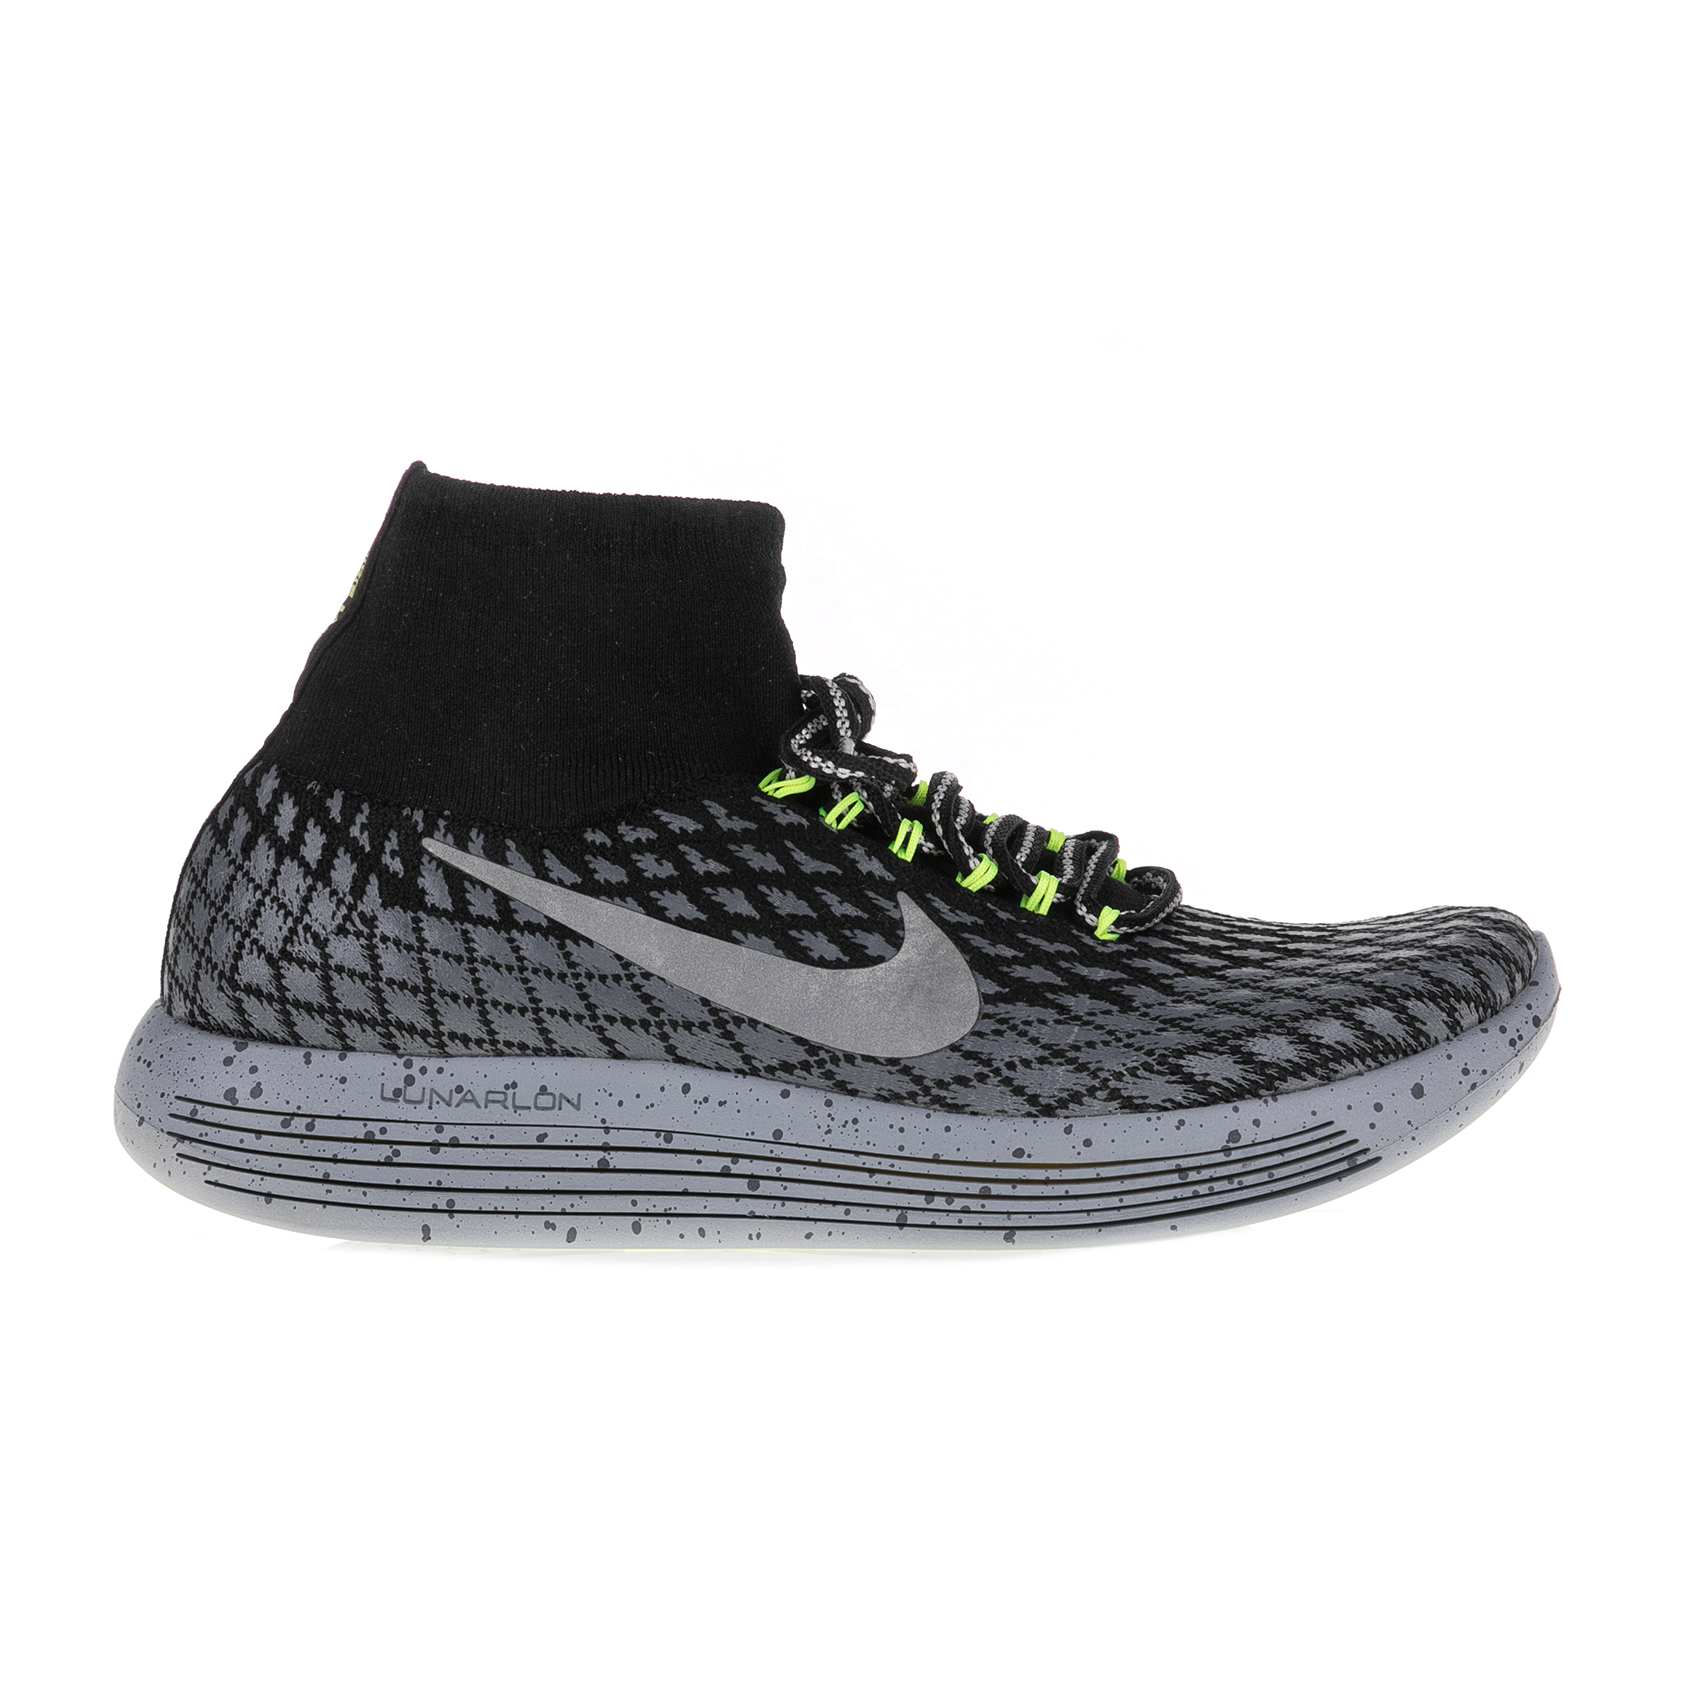 NIKE – Γυναικεία αθλητικά παπούτσια Nike LUNAREPIC FLYKNIT SHIELD γκρι